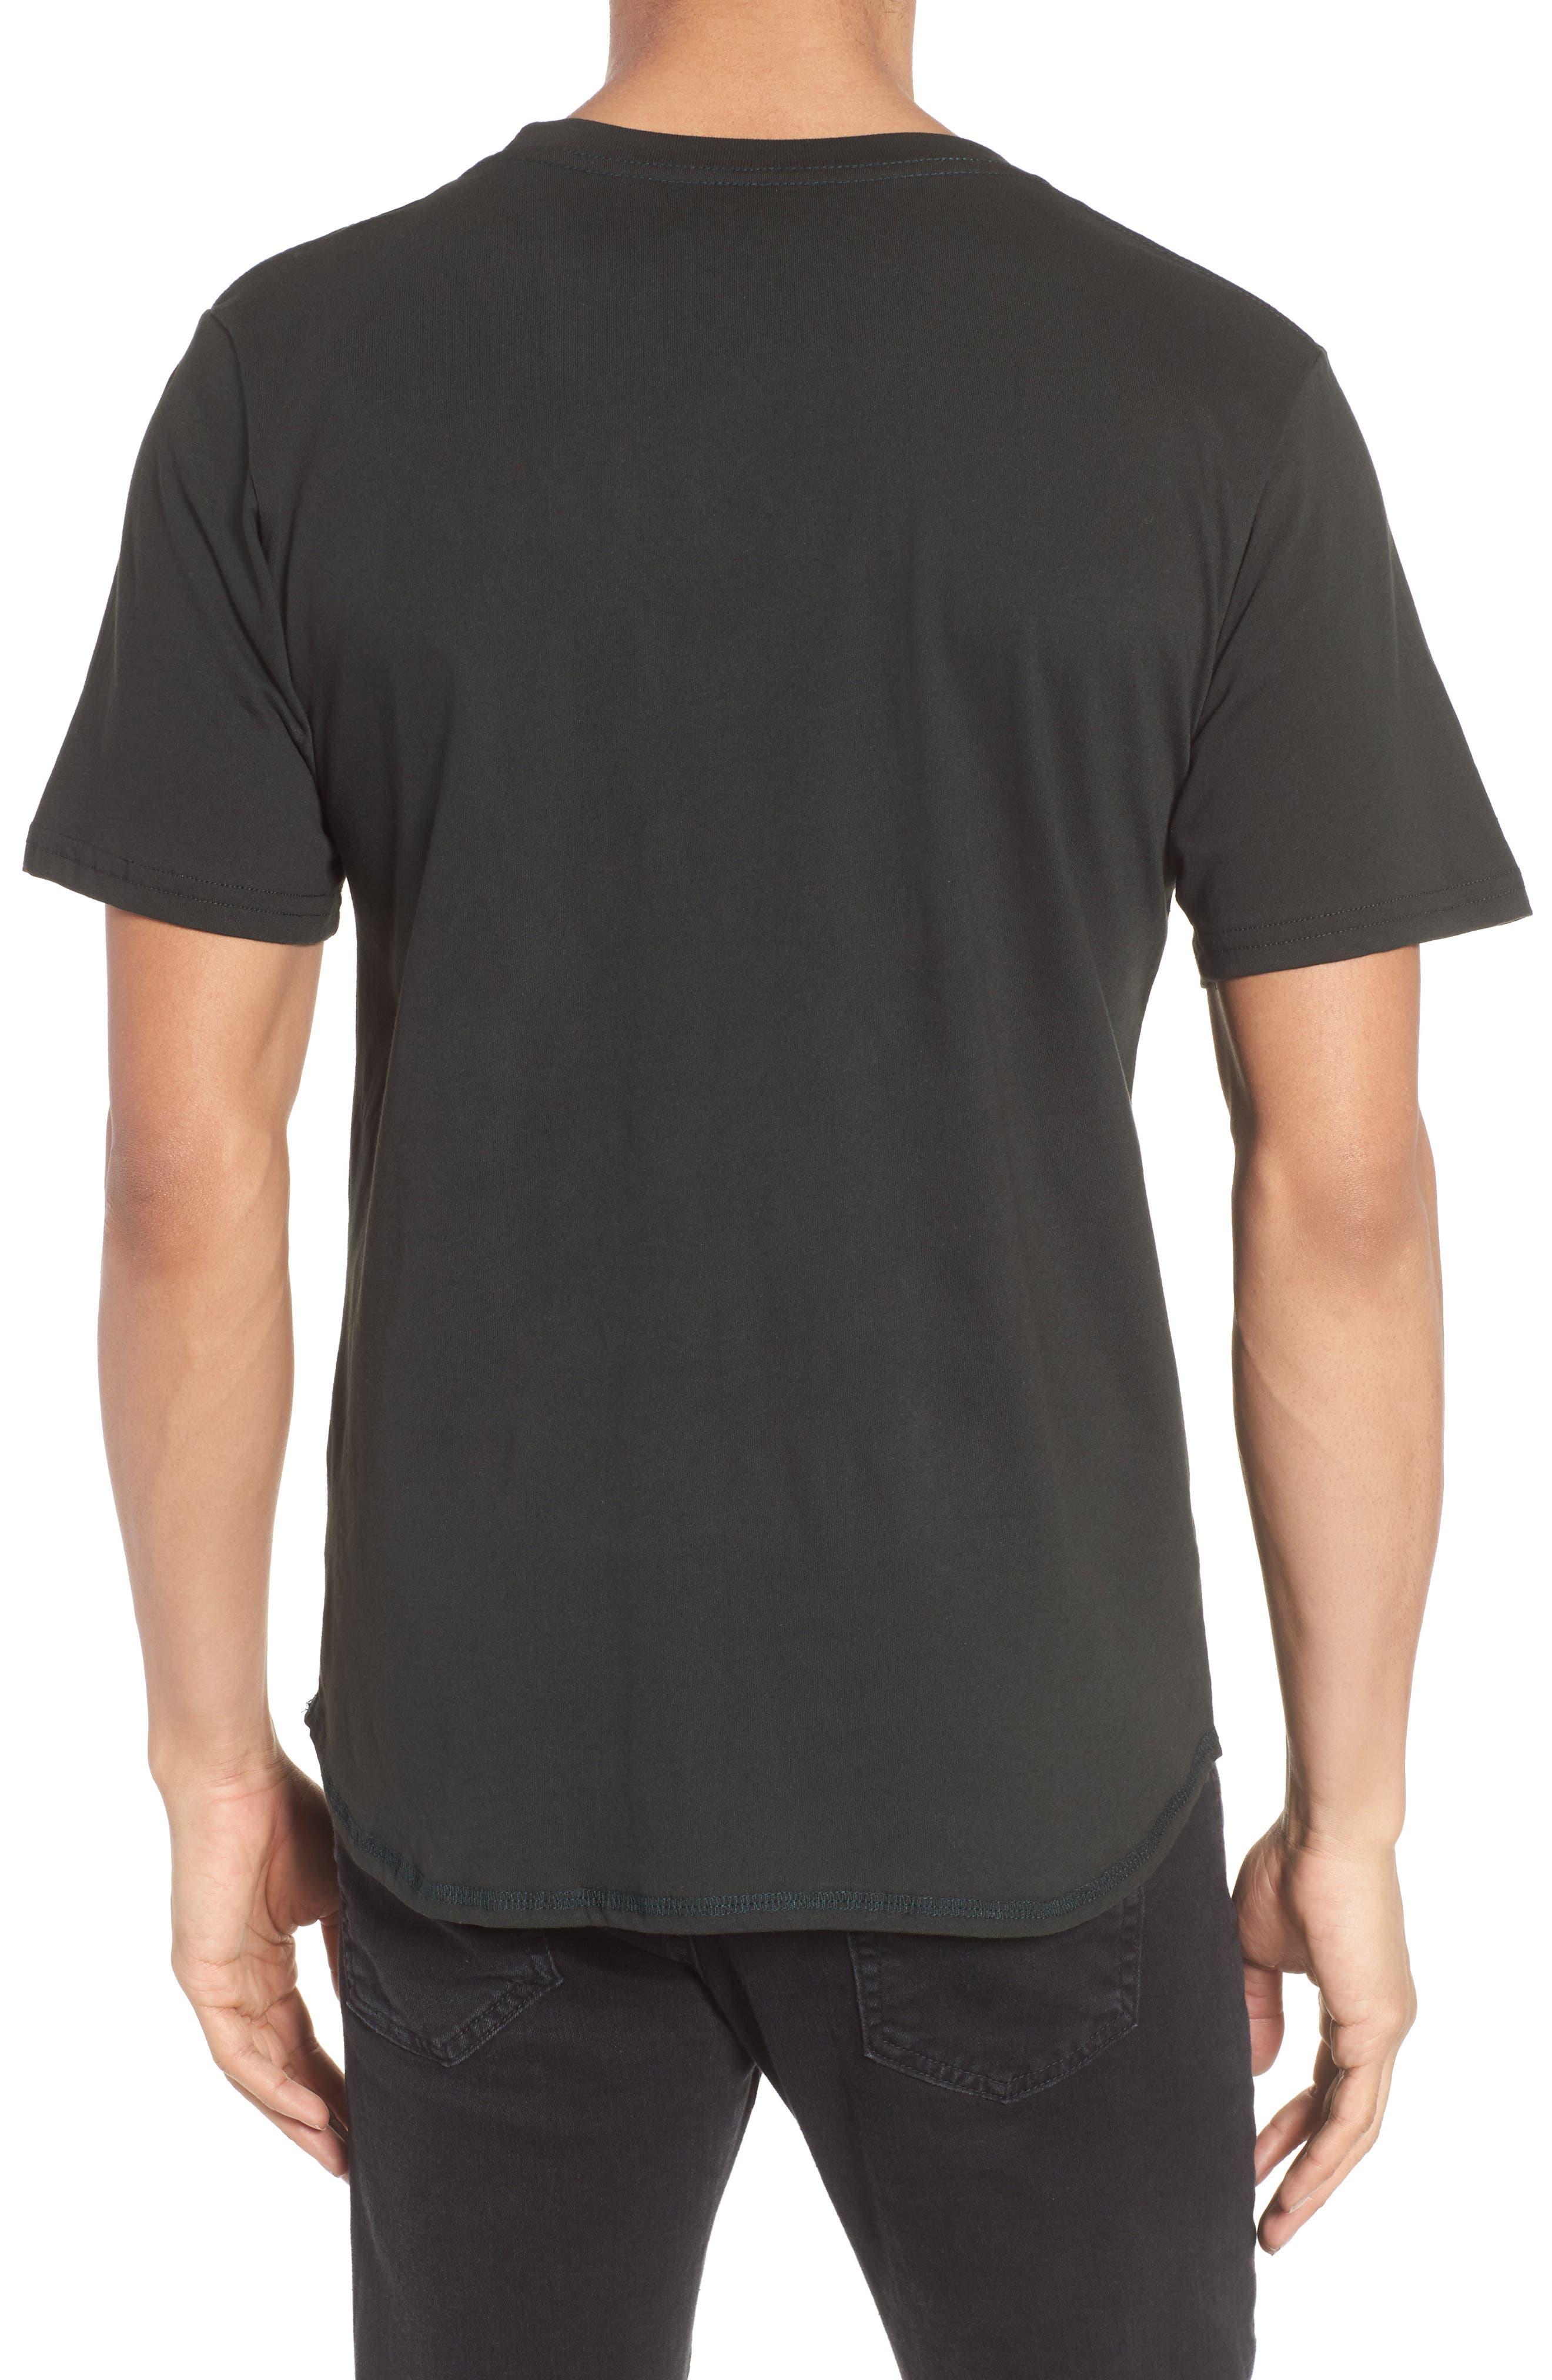 BARKING IRONS,                             Engine Americus Graphic T-Shirt,                             Alternate thumbnail 2, color,                             001